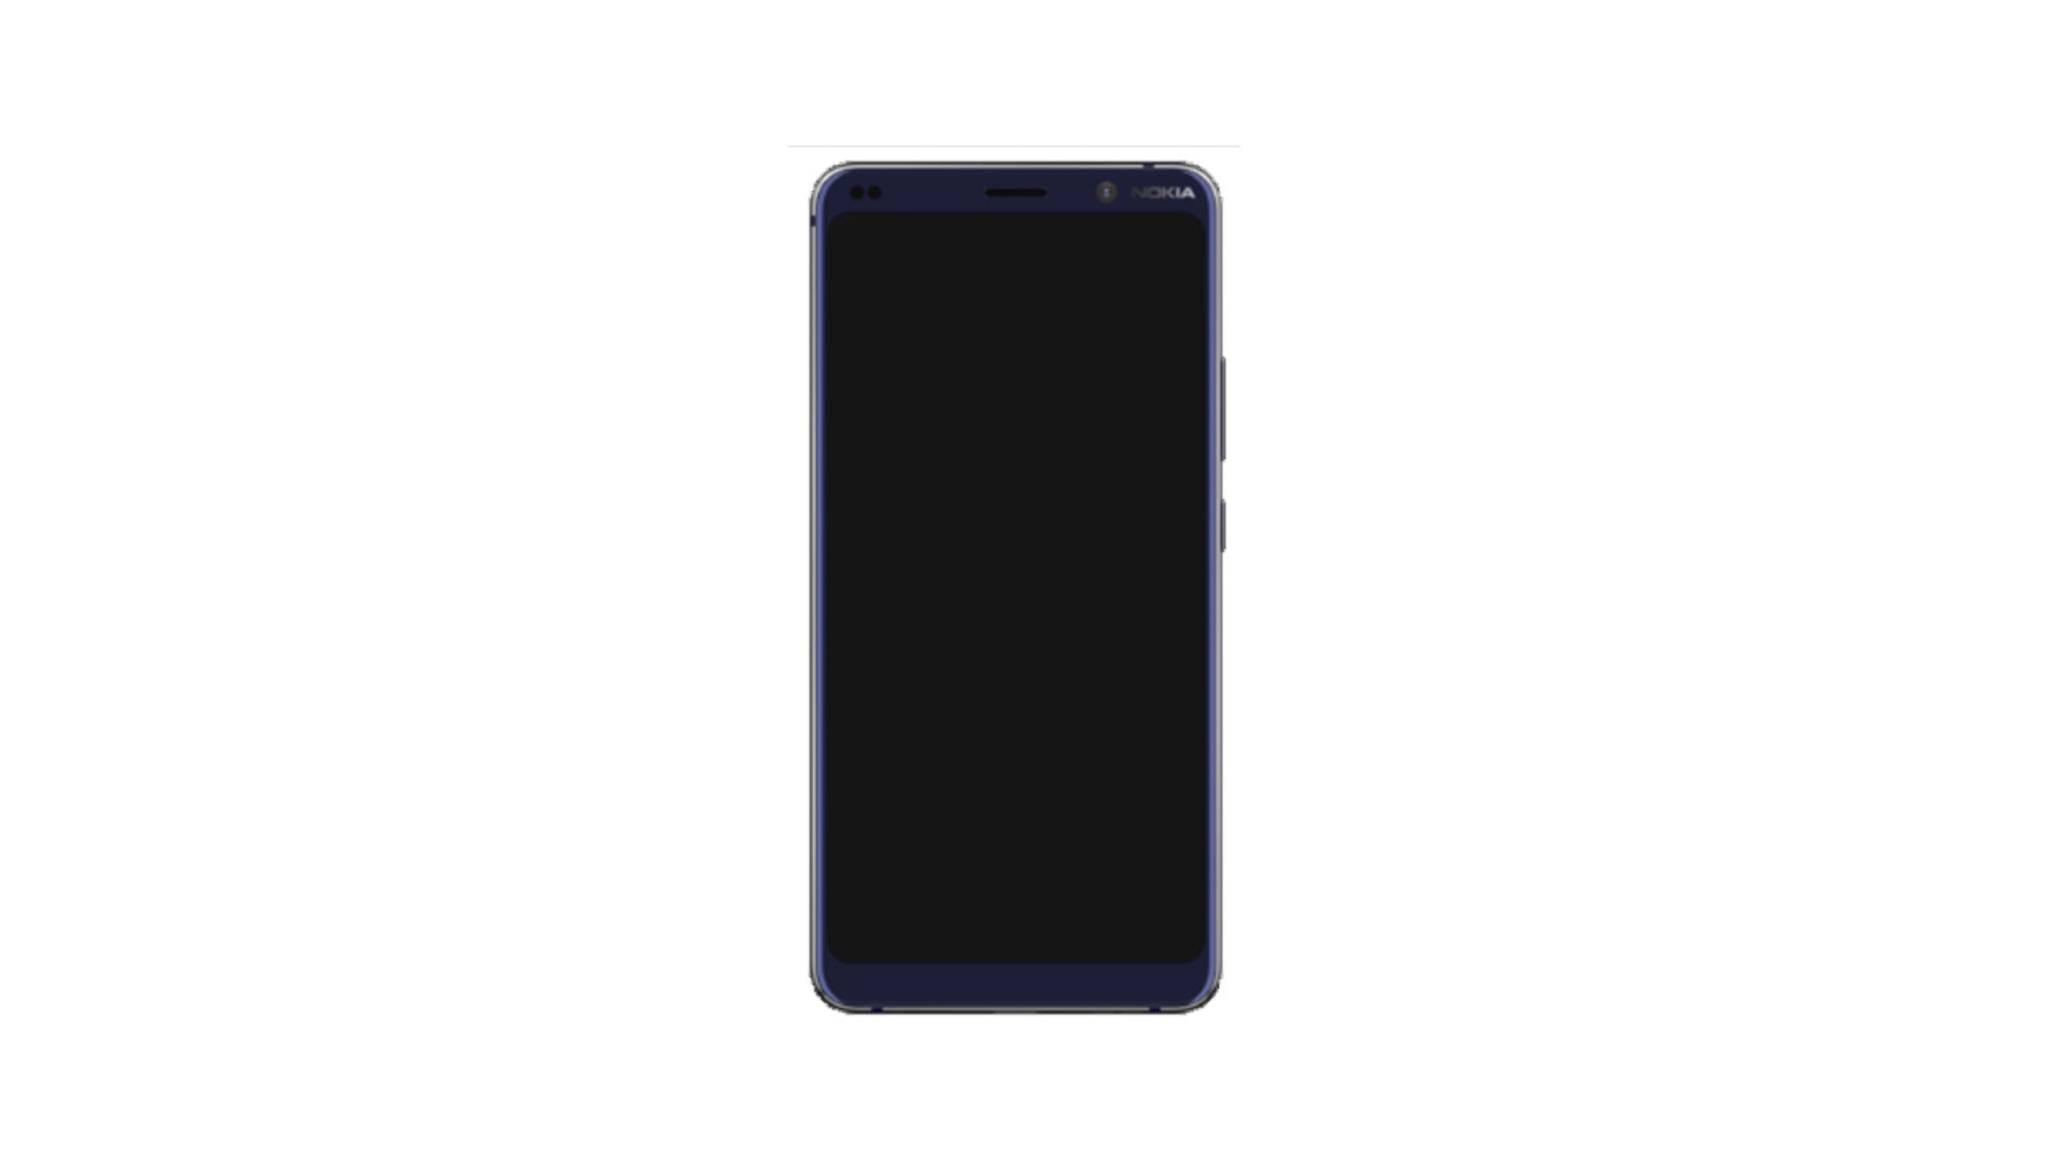 Nokia 9 PureView: Offizielles Pressebild & technische Daten geleakt